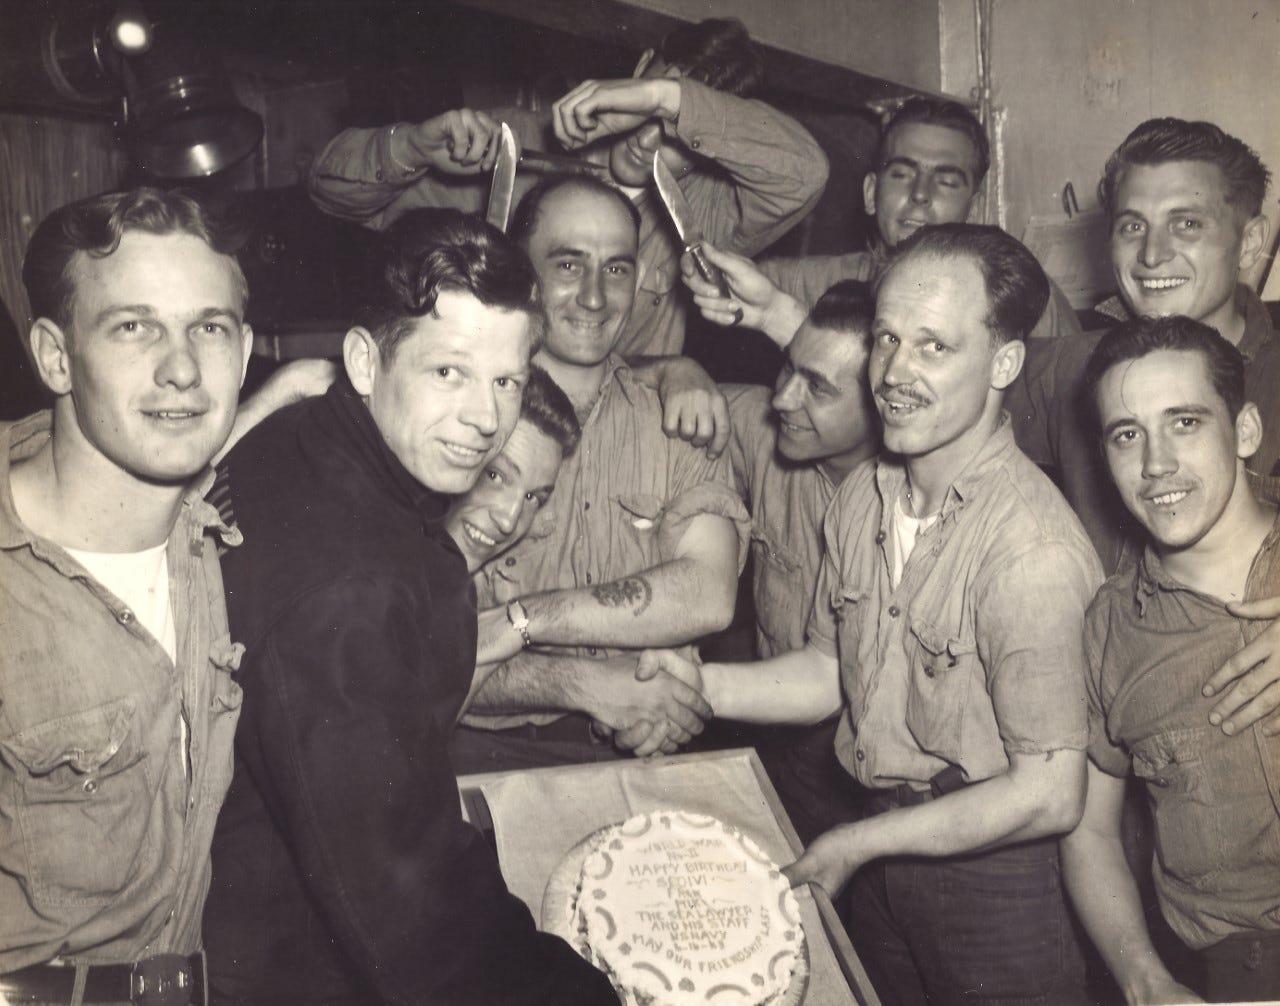 Crewmen of the USS Indianapolis gather to celebrate Alfred Sedivi's birthday.